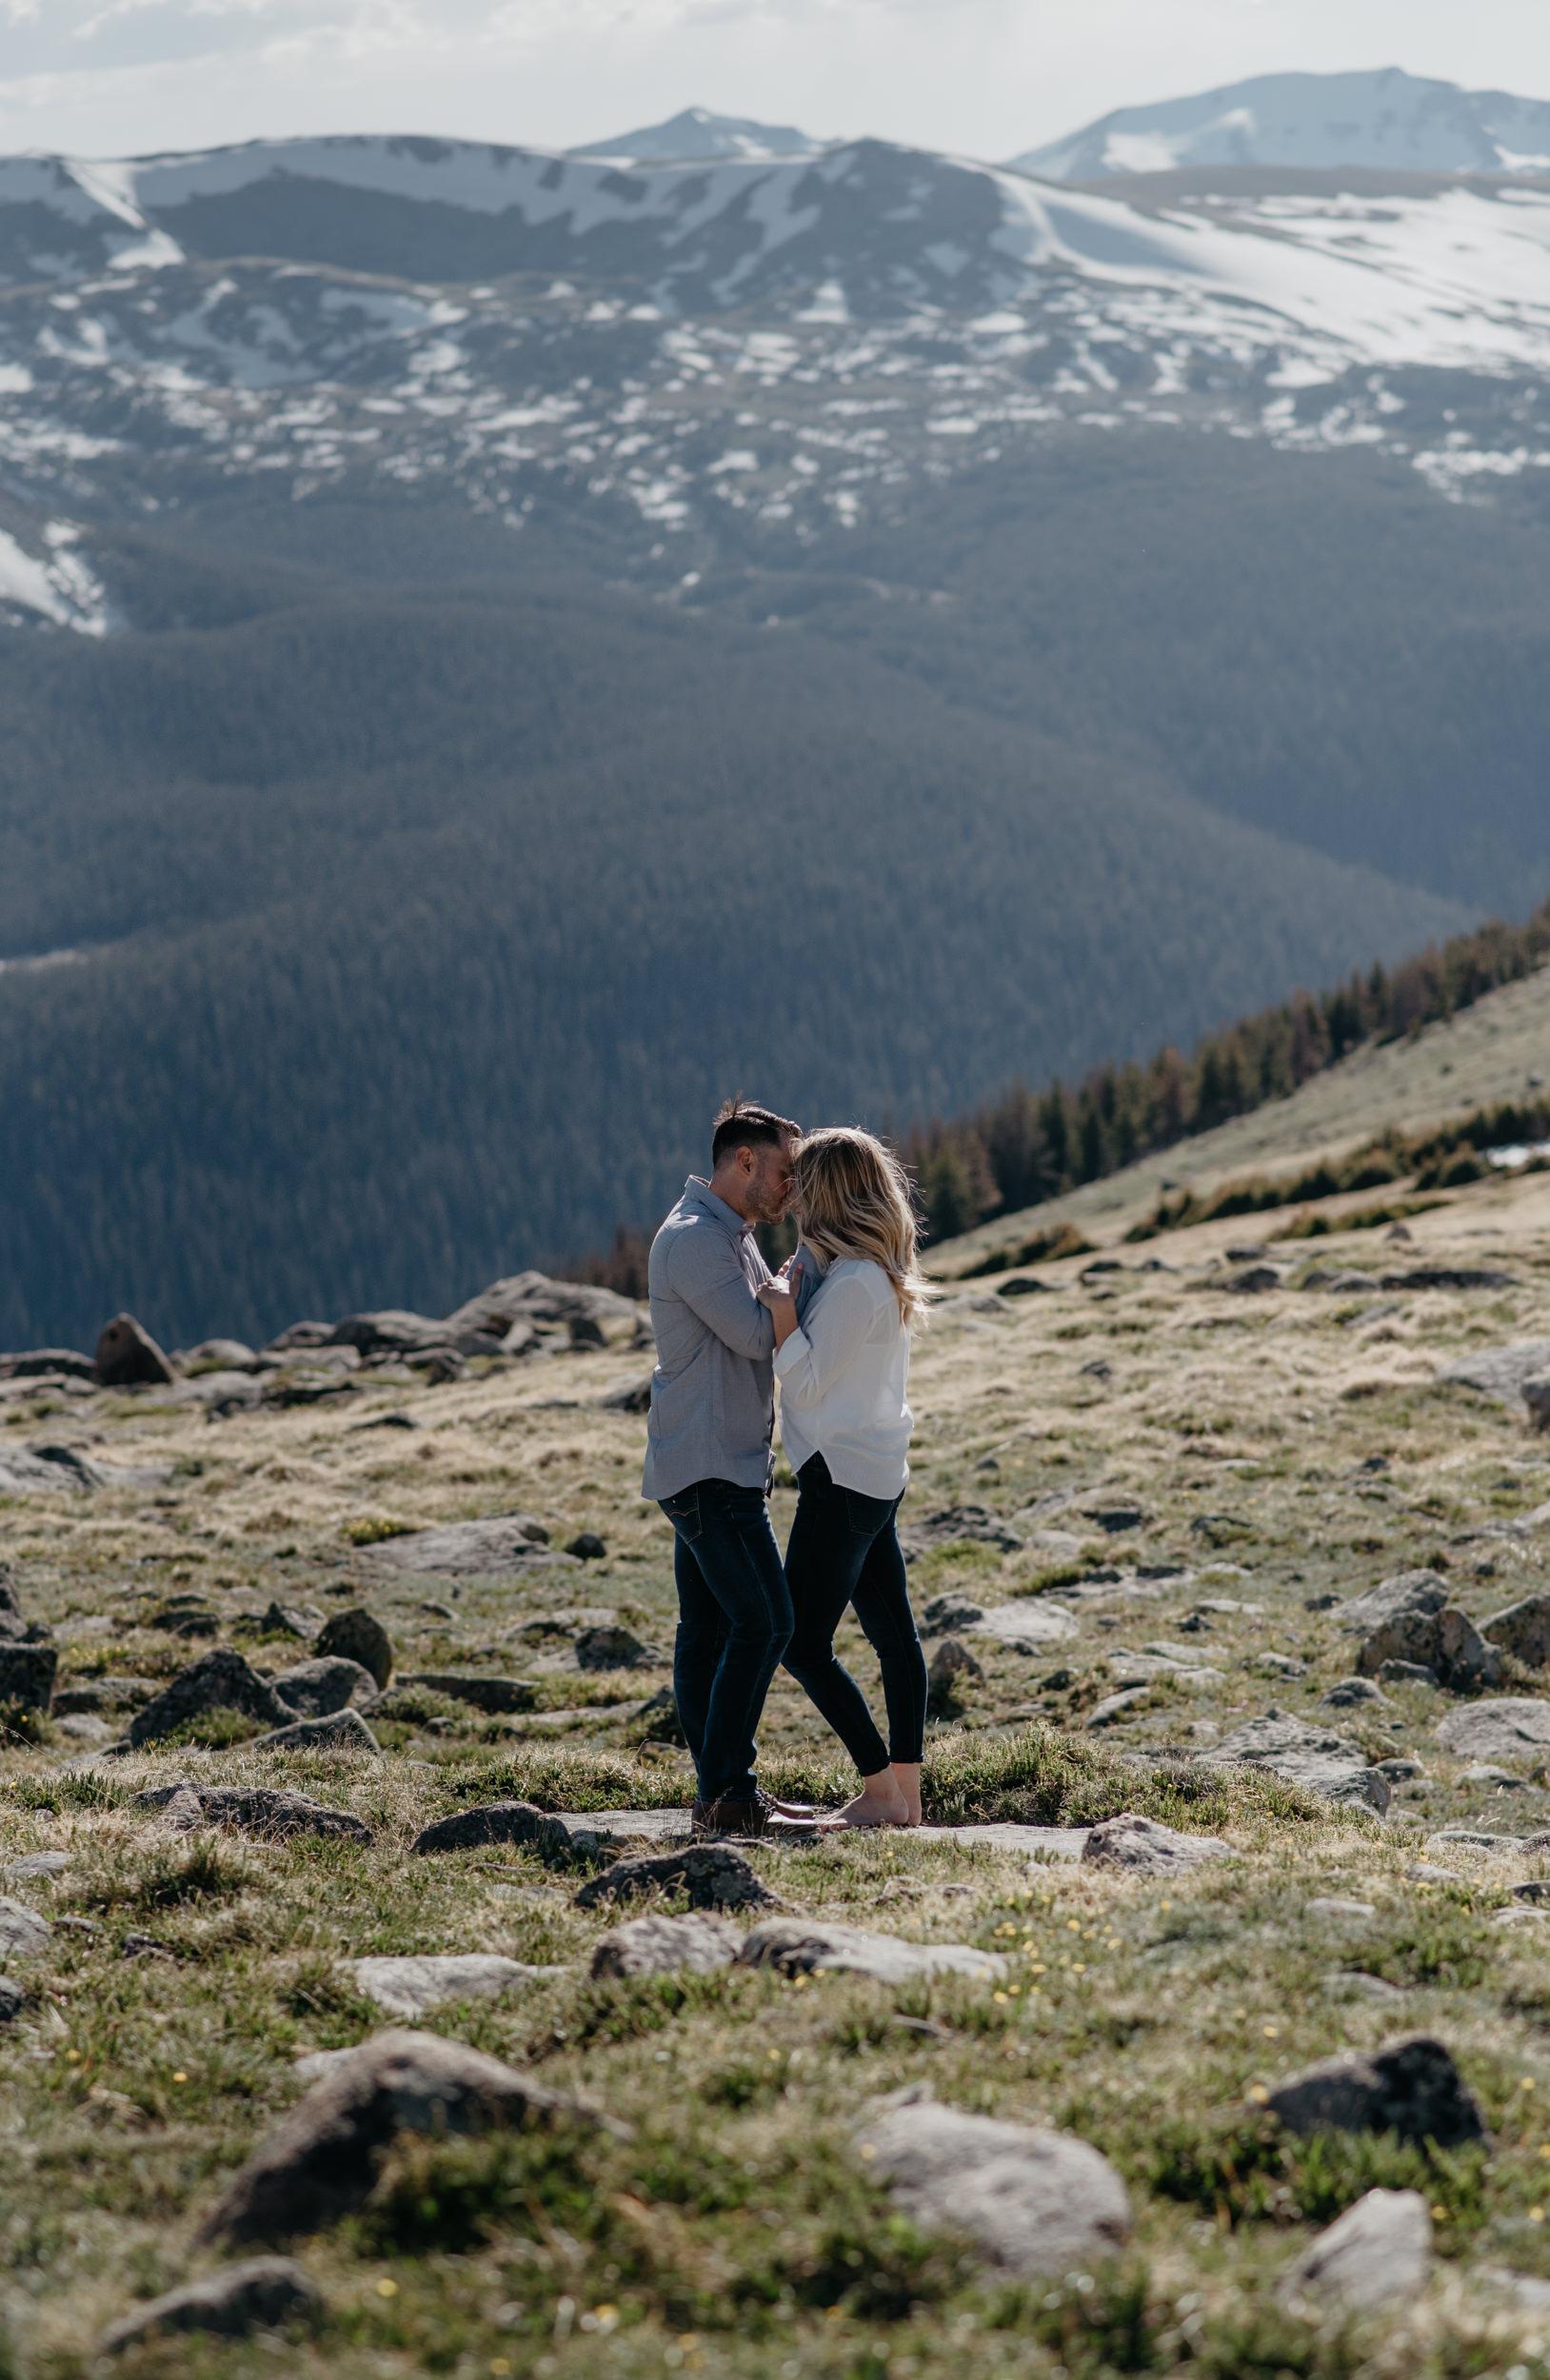 Colorado engagement session photographer. Trail Ridge Road engagement session